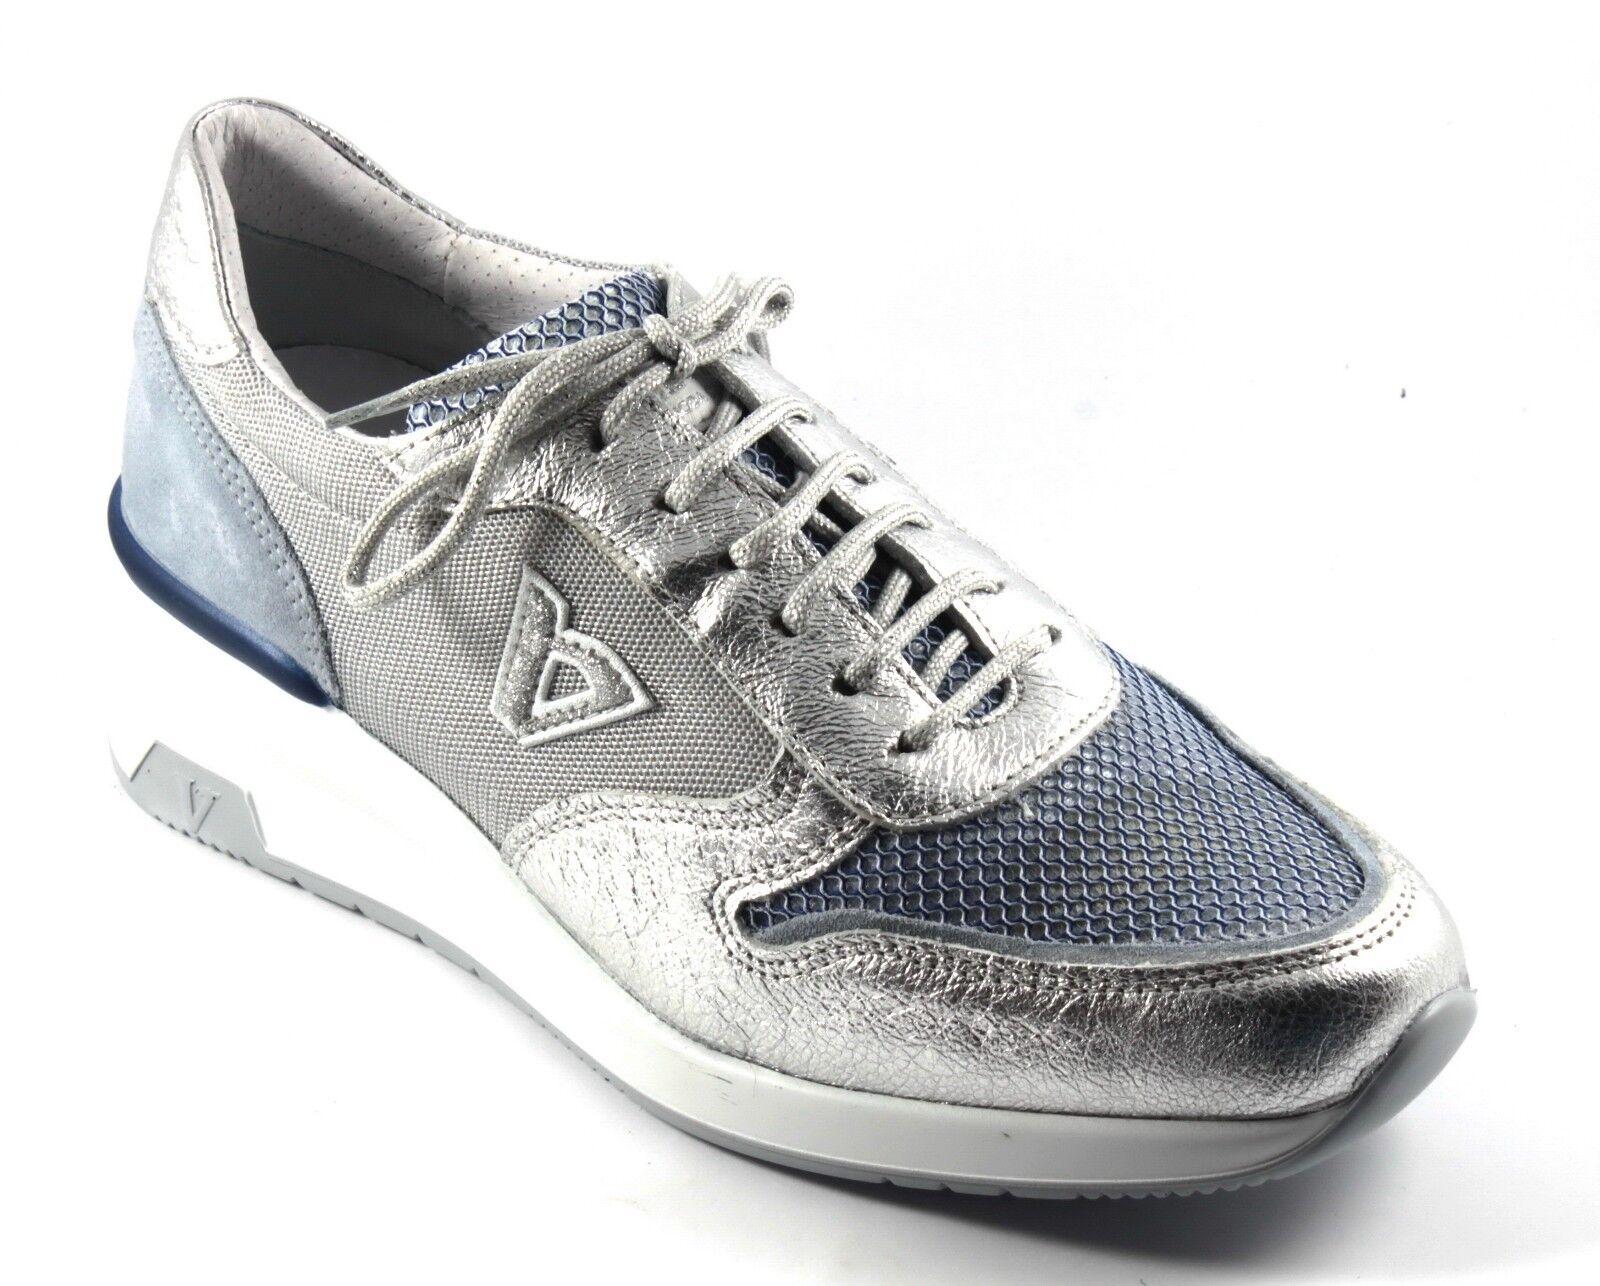 VALLEVERDE Schuhe SNEAKERS SNEAKERS SNEAKERS TENNIS Damens CASUAL ZEPPA ALLACCIATE MIX ARGENTO n.38 2dc0c9